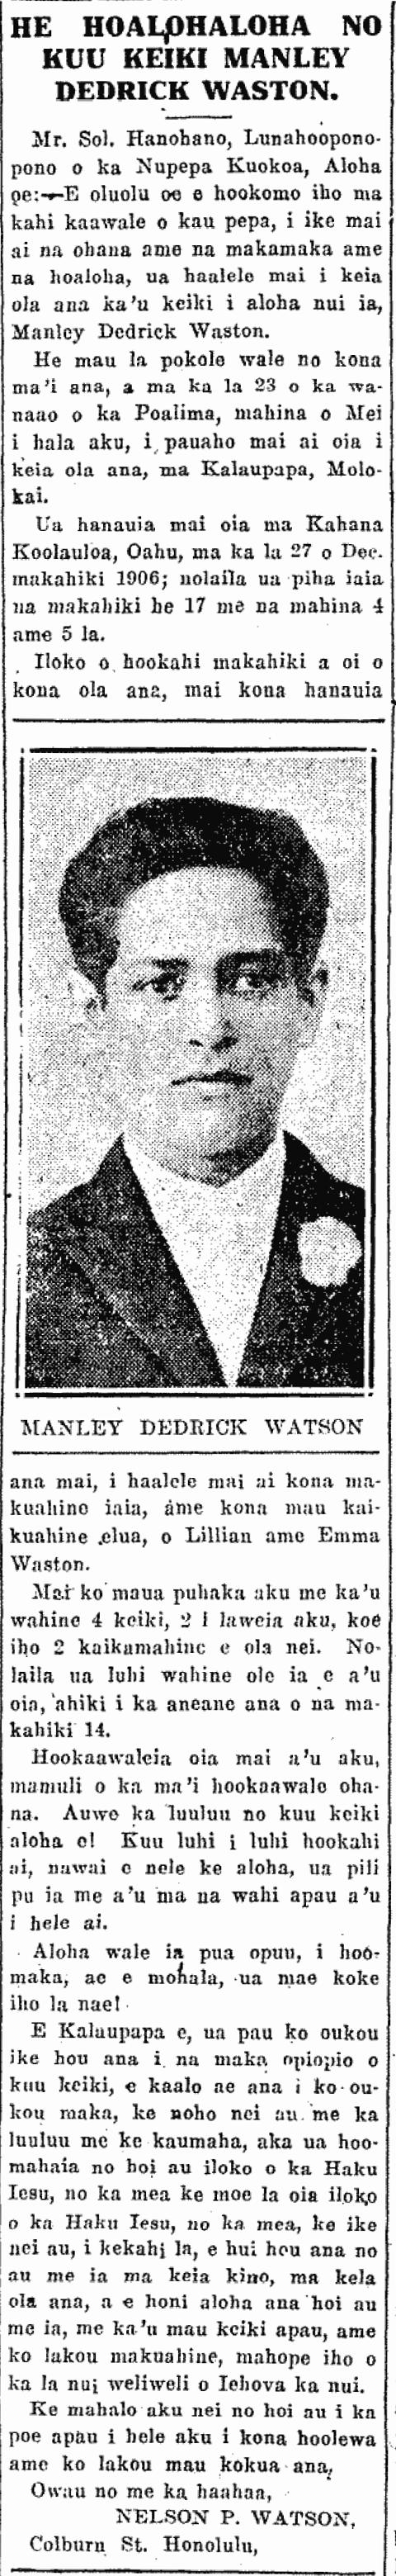 HE HOALOHALOHA NO KUU KEIKI MANLEY DEDRICK WASTON.